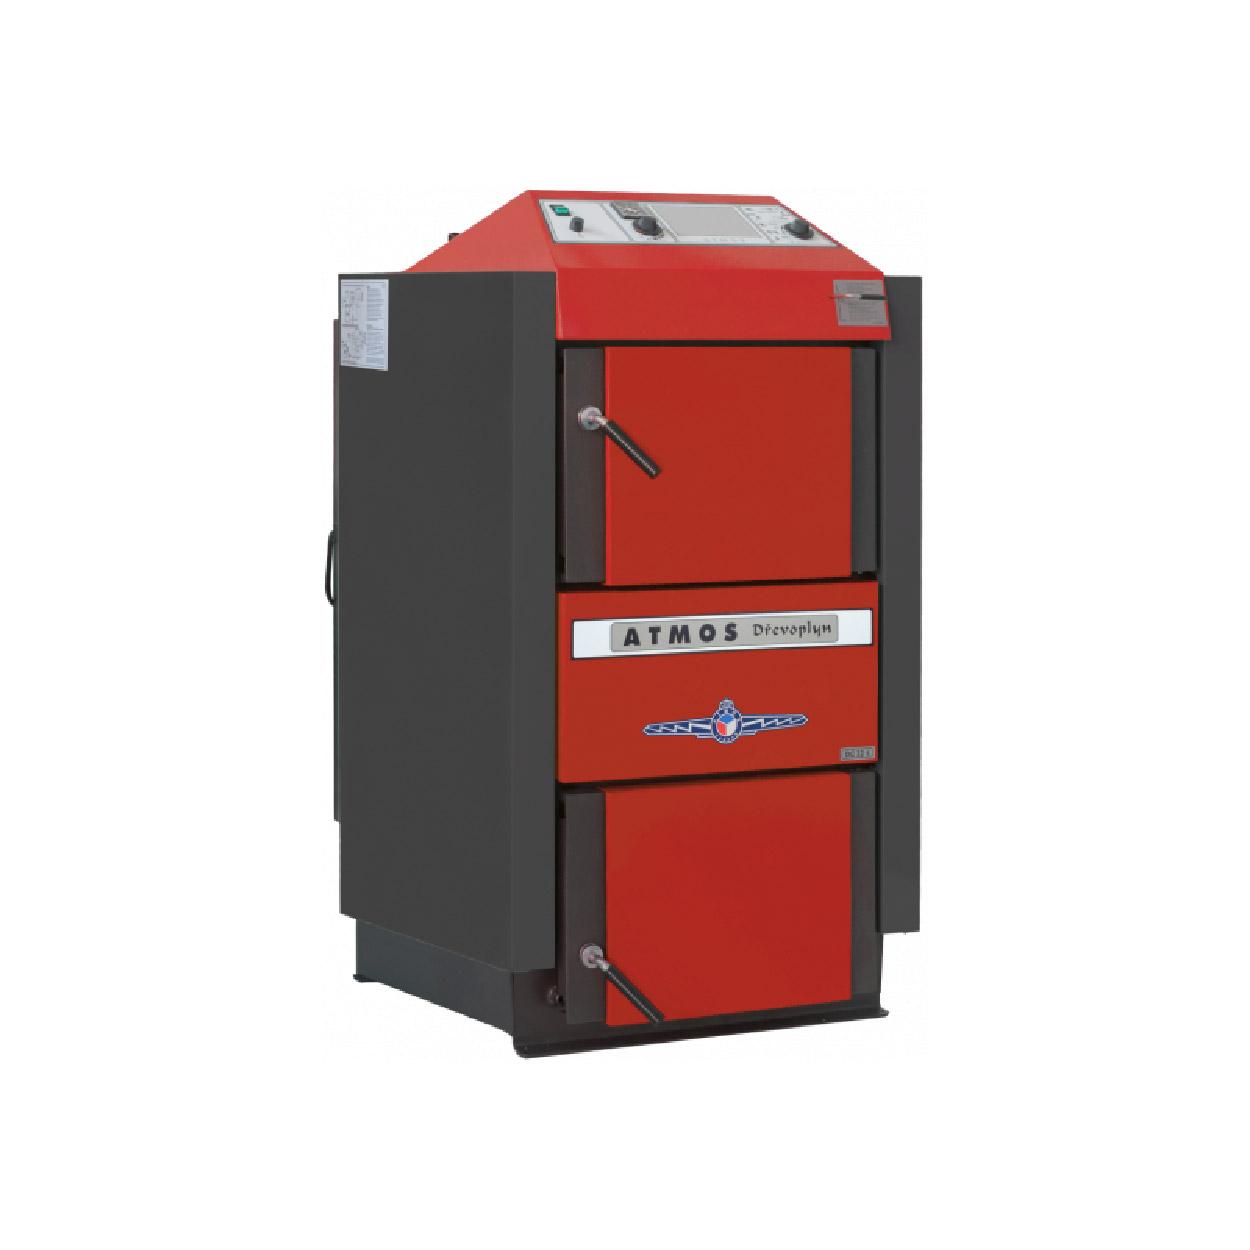 Centrala termica pe lemne Atmos DC22SX 22 kW fornello imagine